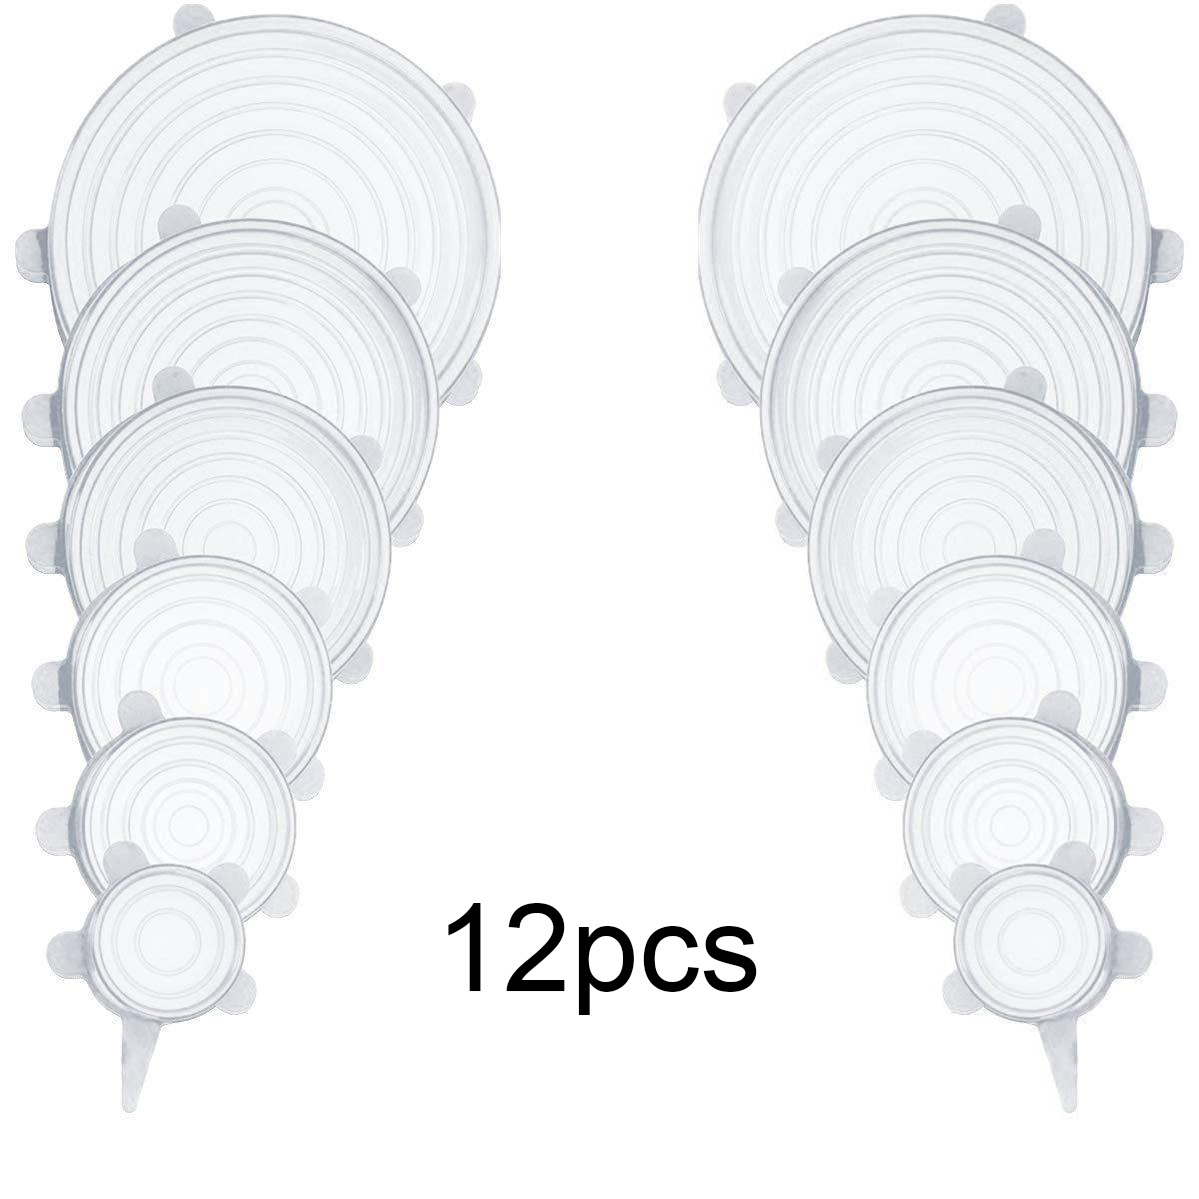 12Pcs White